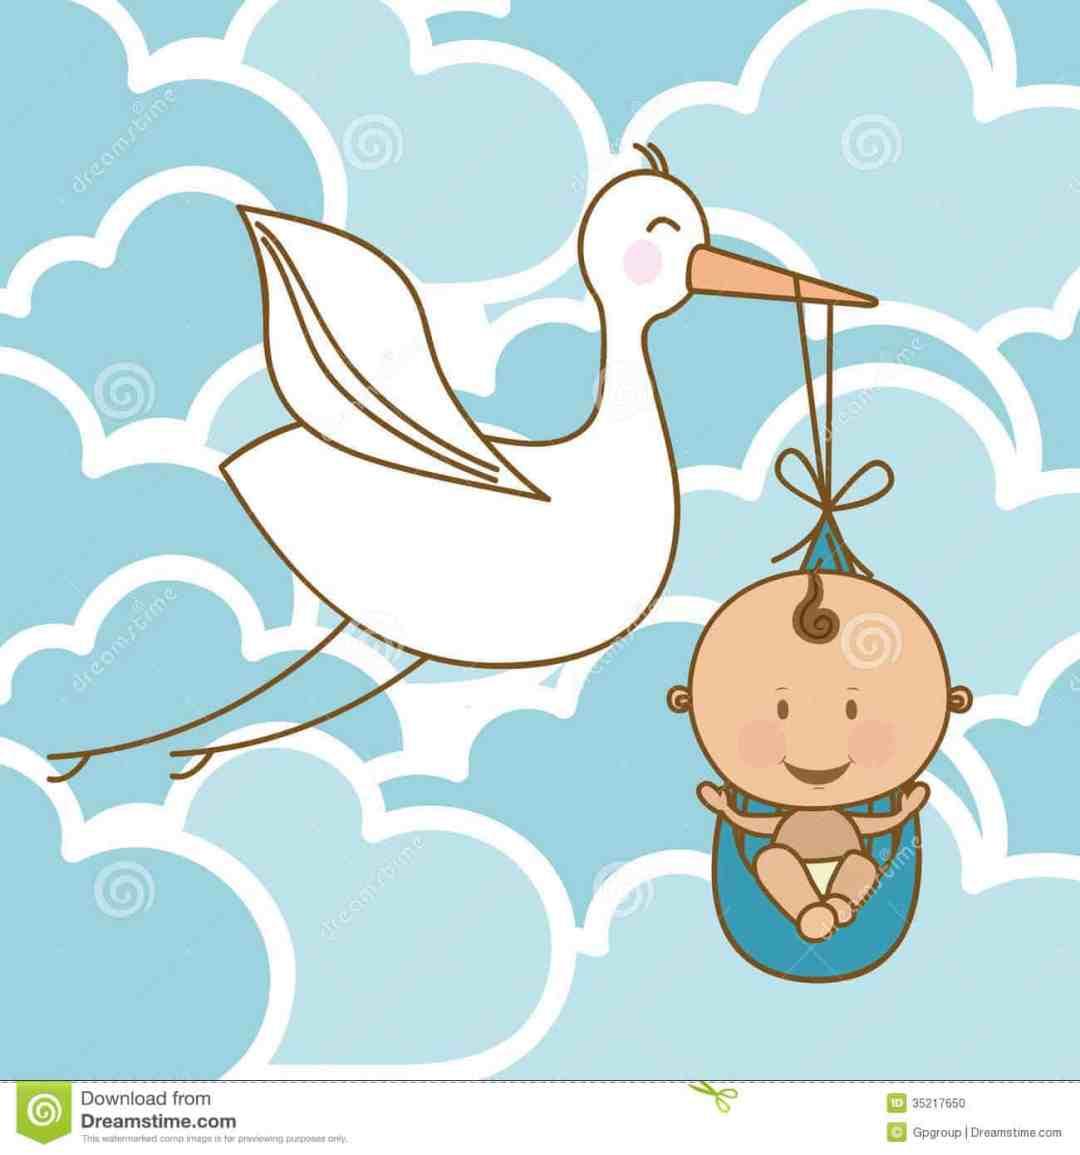 baby-arrival-design-over-clouds-background-illustration-35217650